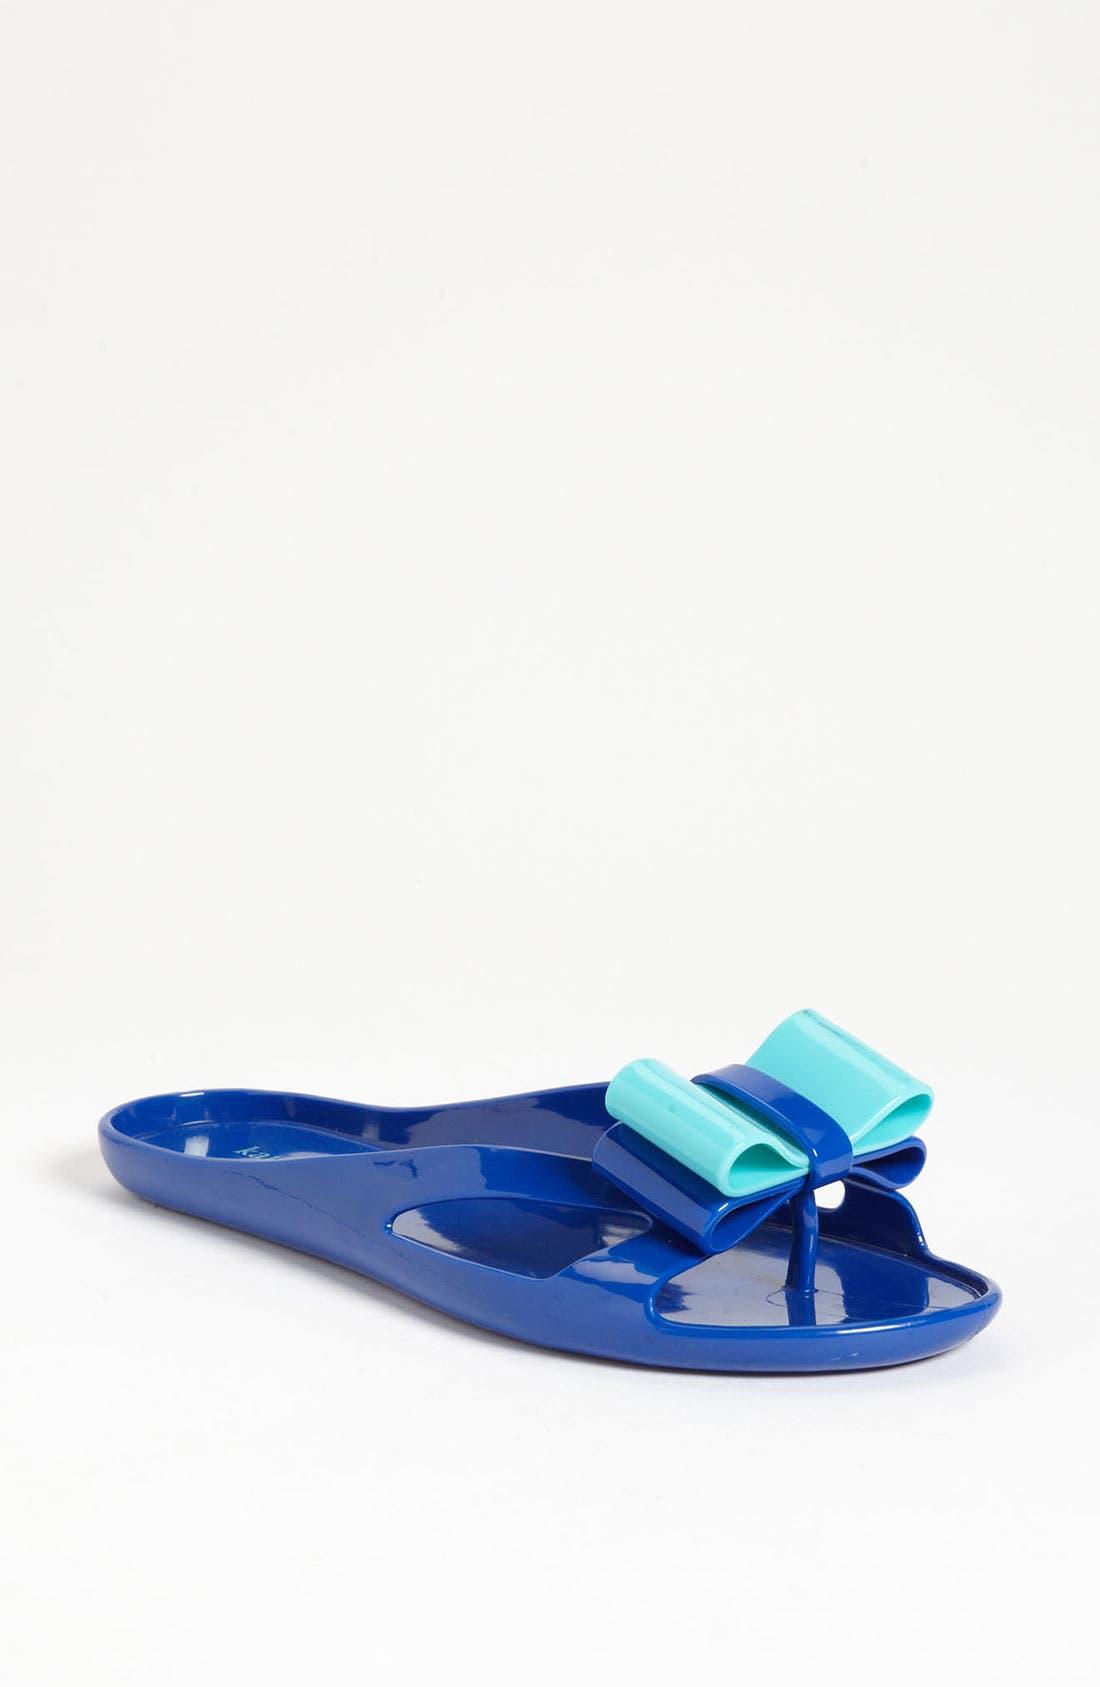 Main Image - kate spade new york 'bennie' sandal